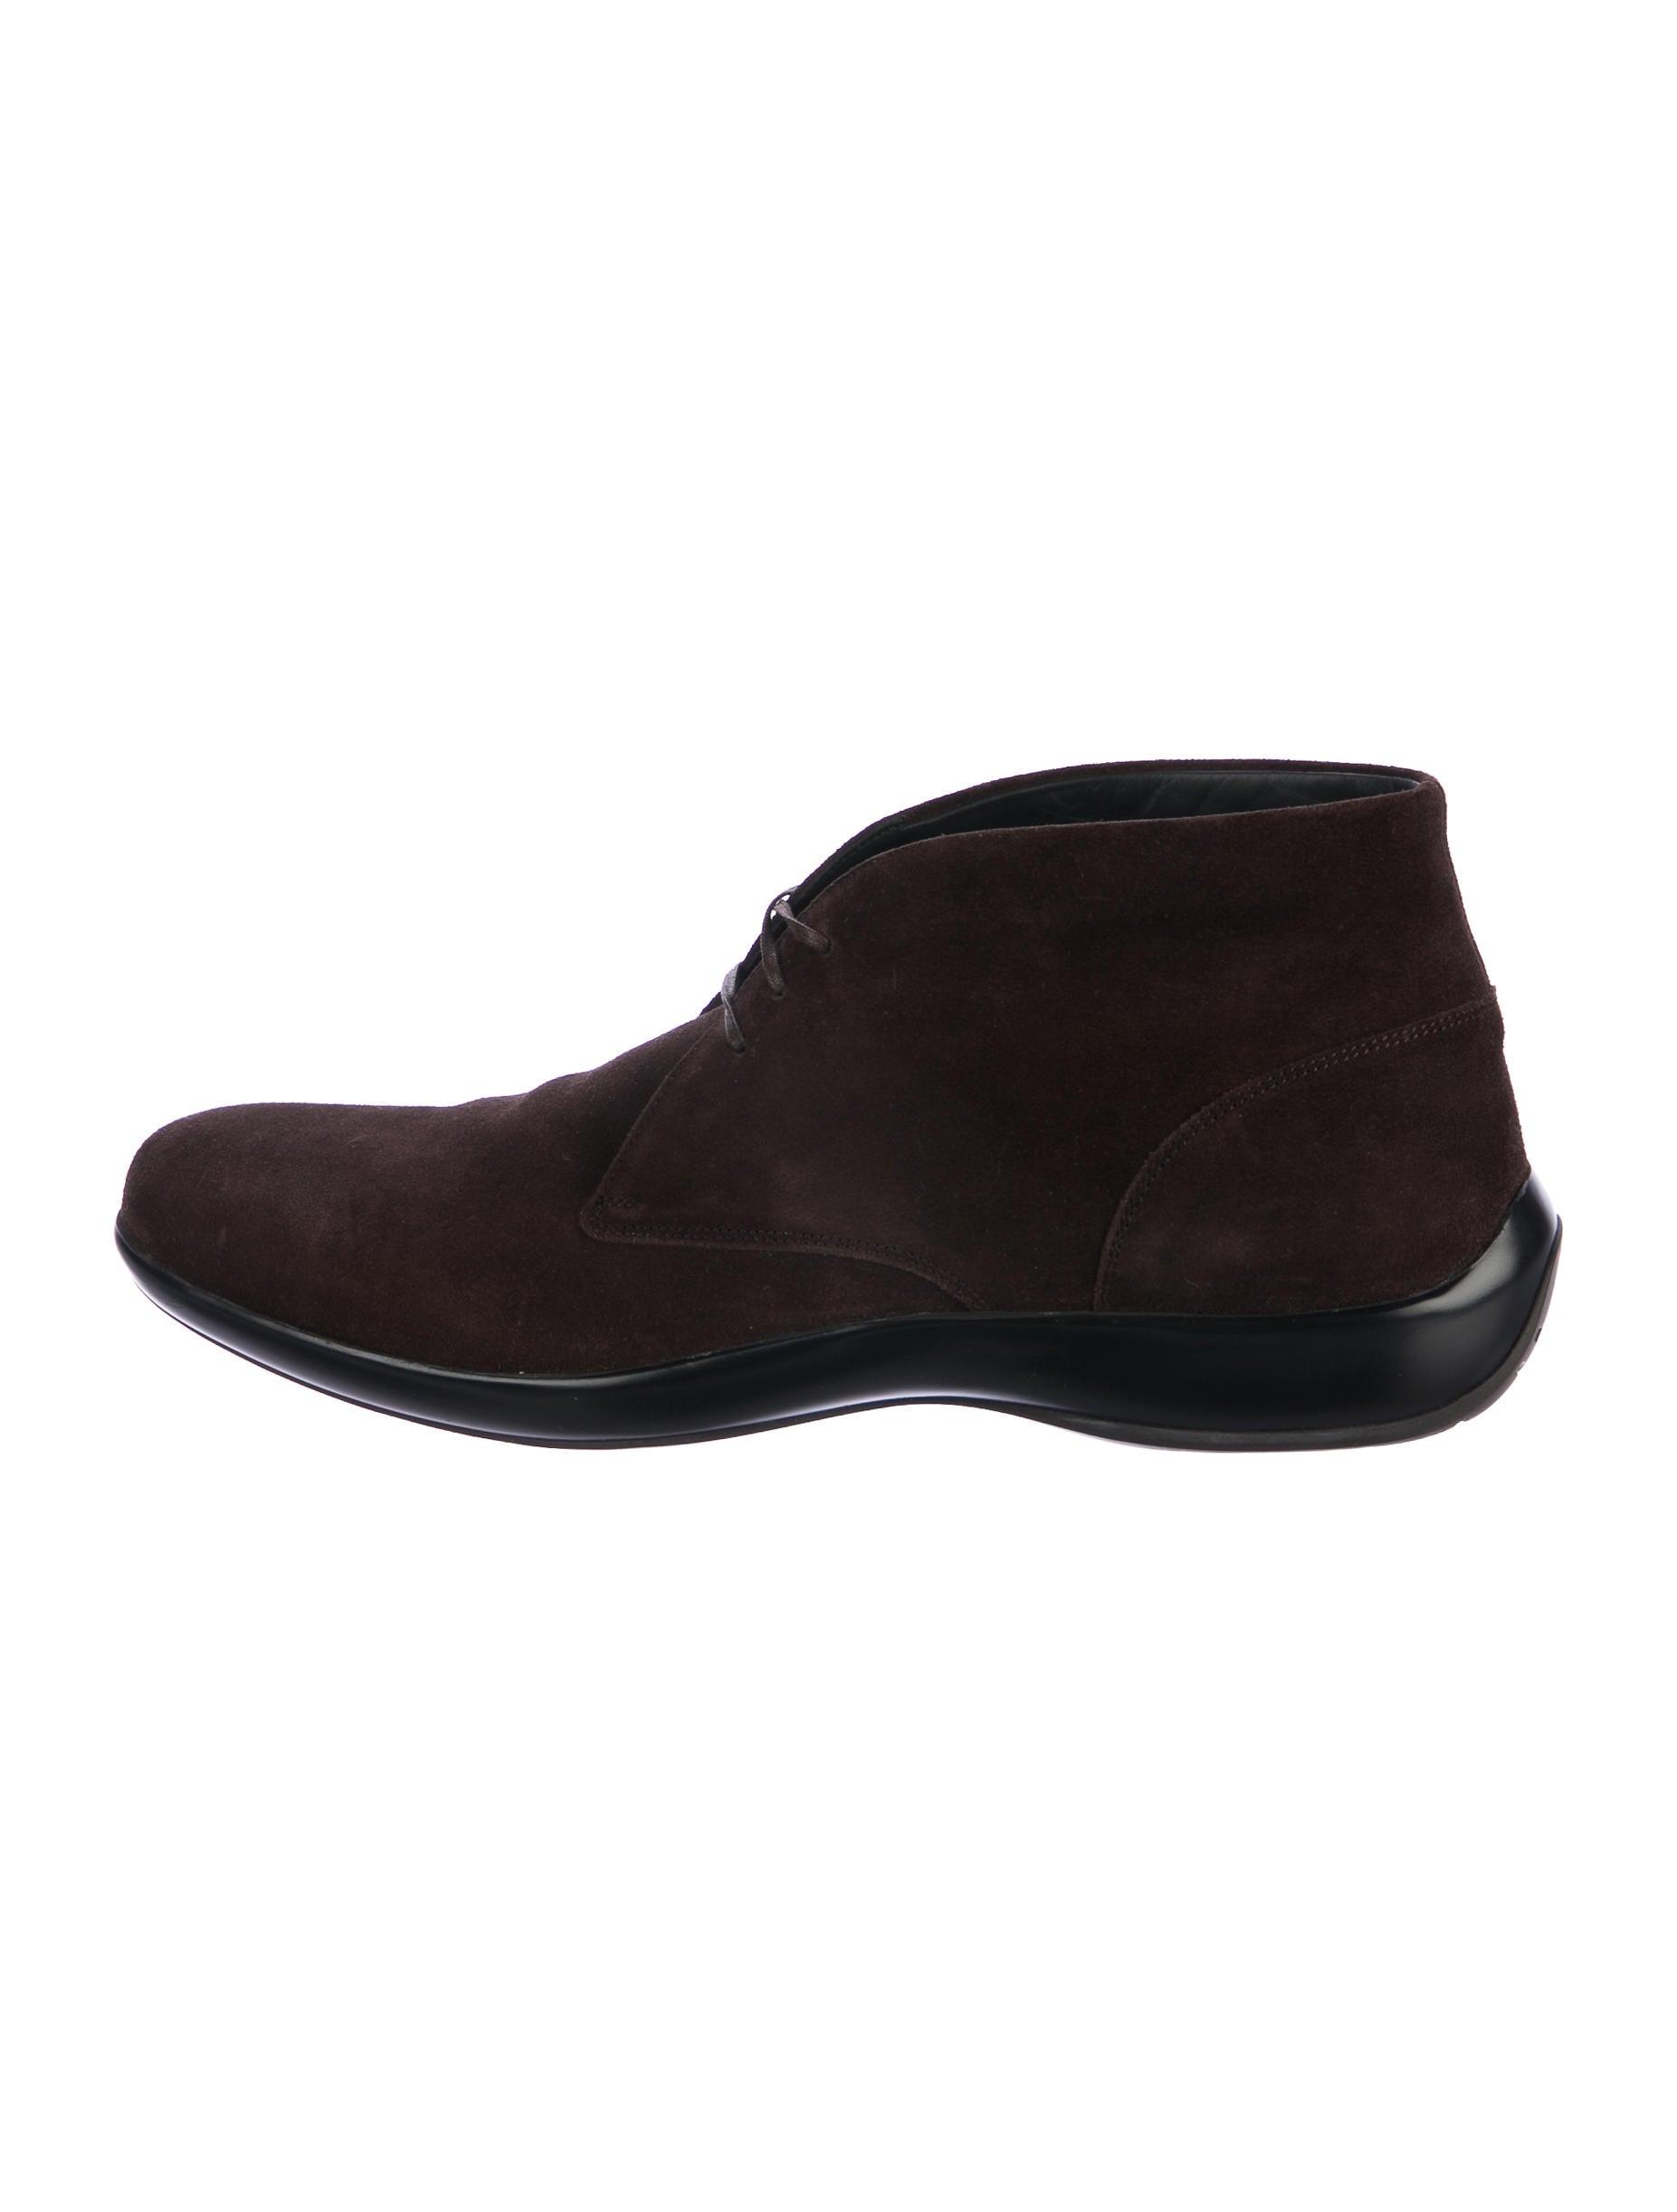 salvatore ferragamo suede desert boots shoes sal52742